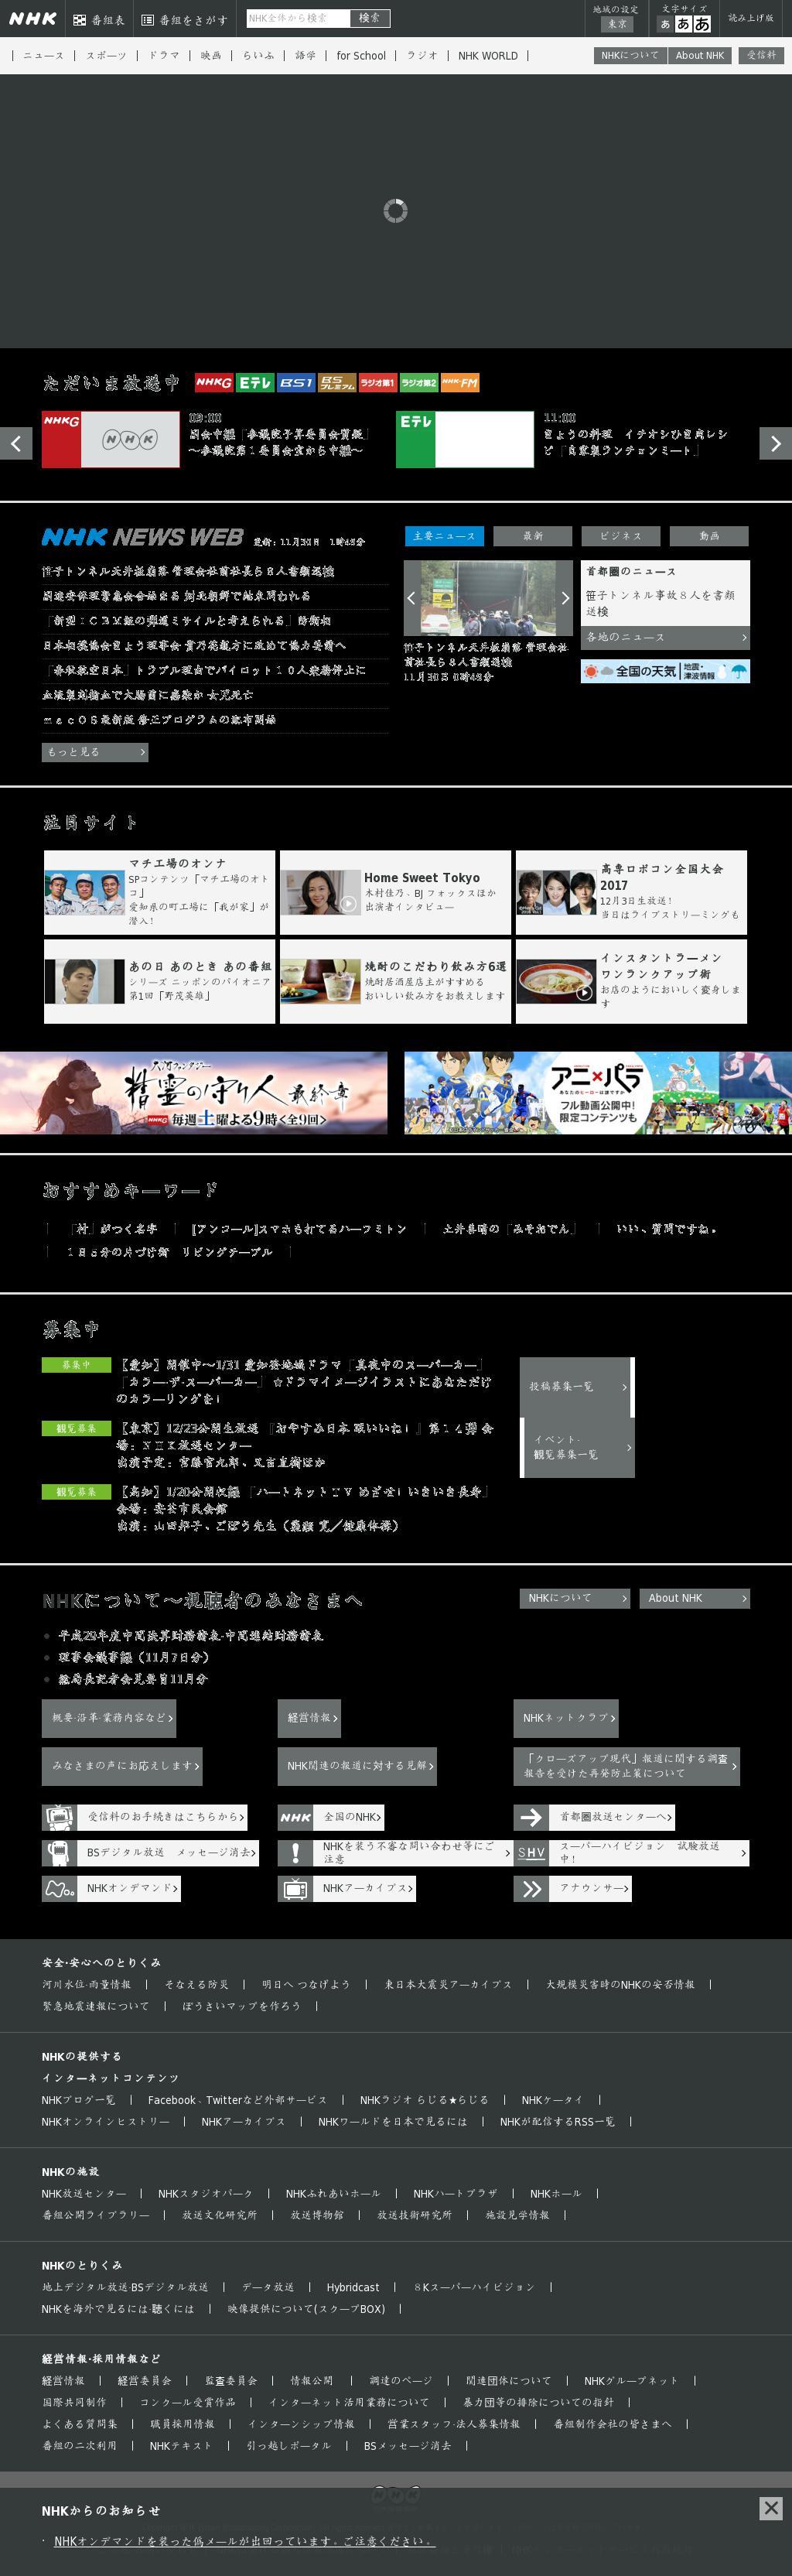 NHK Online at Monday March 12, 2018, 9:15 a.m. UTC